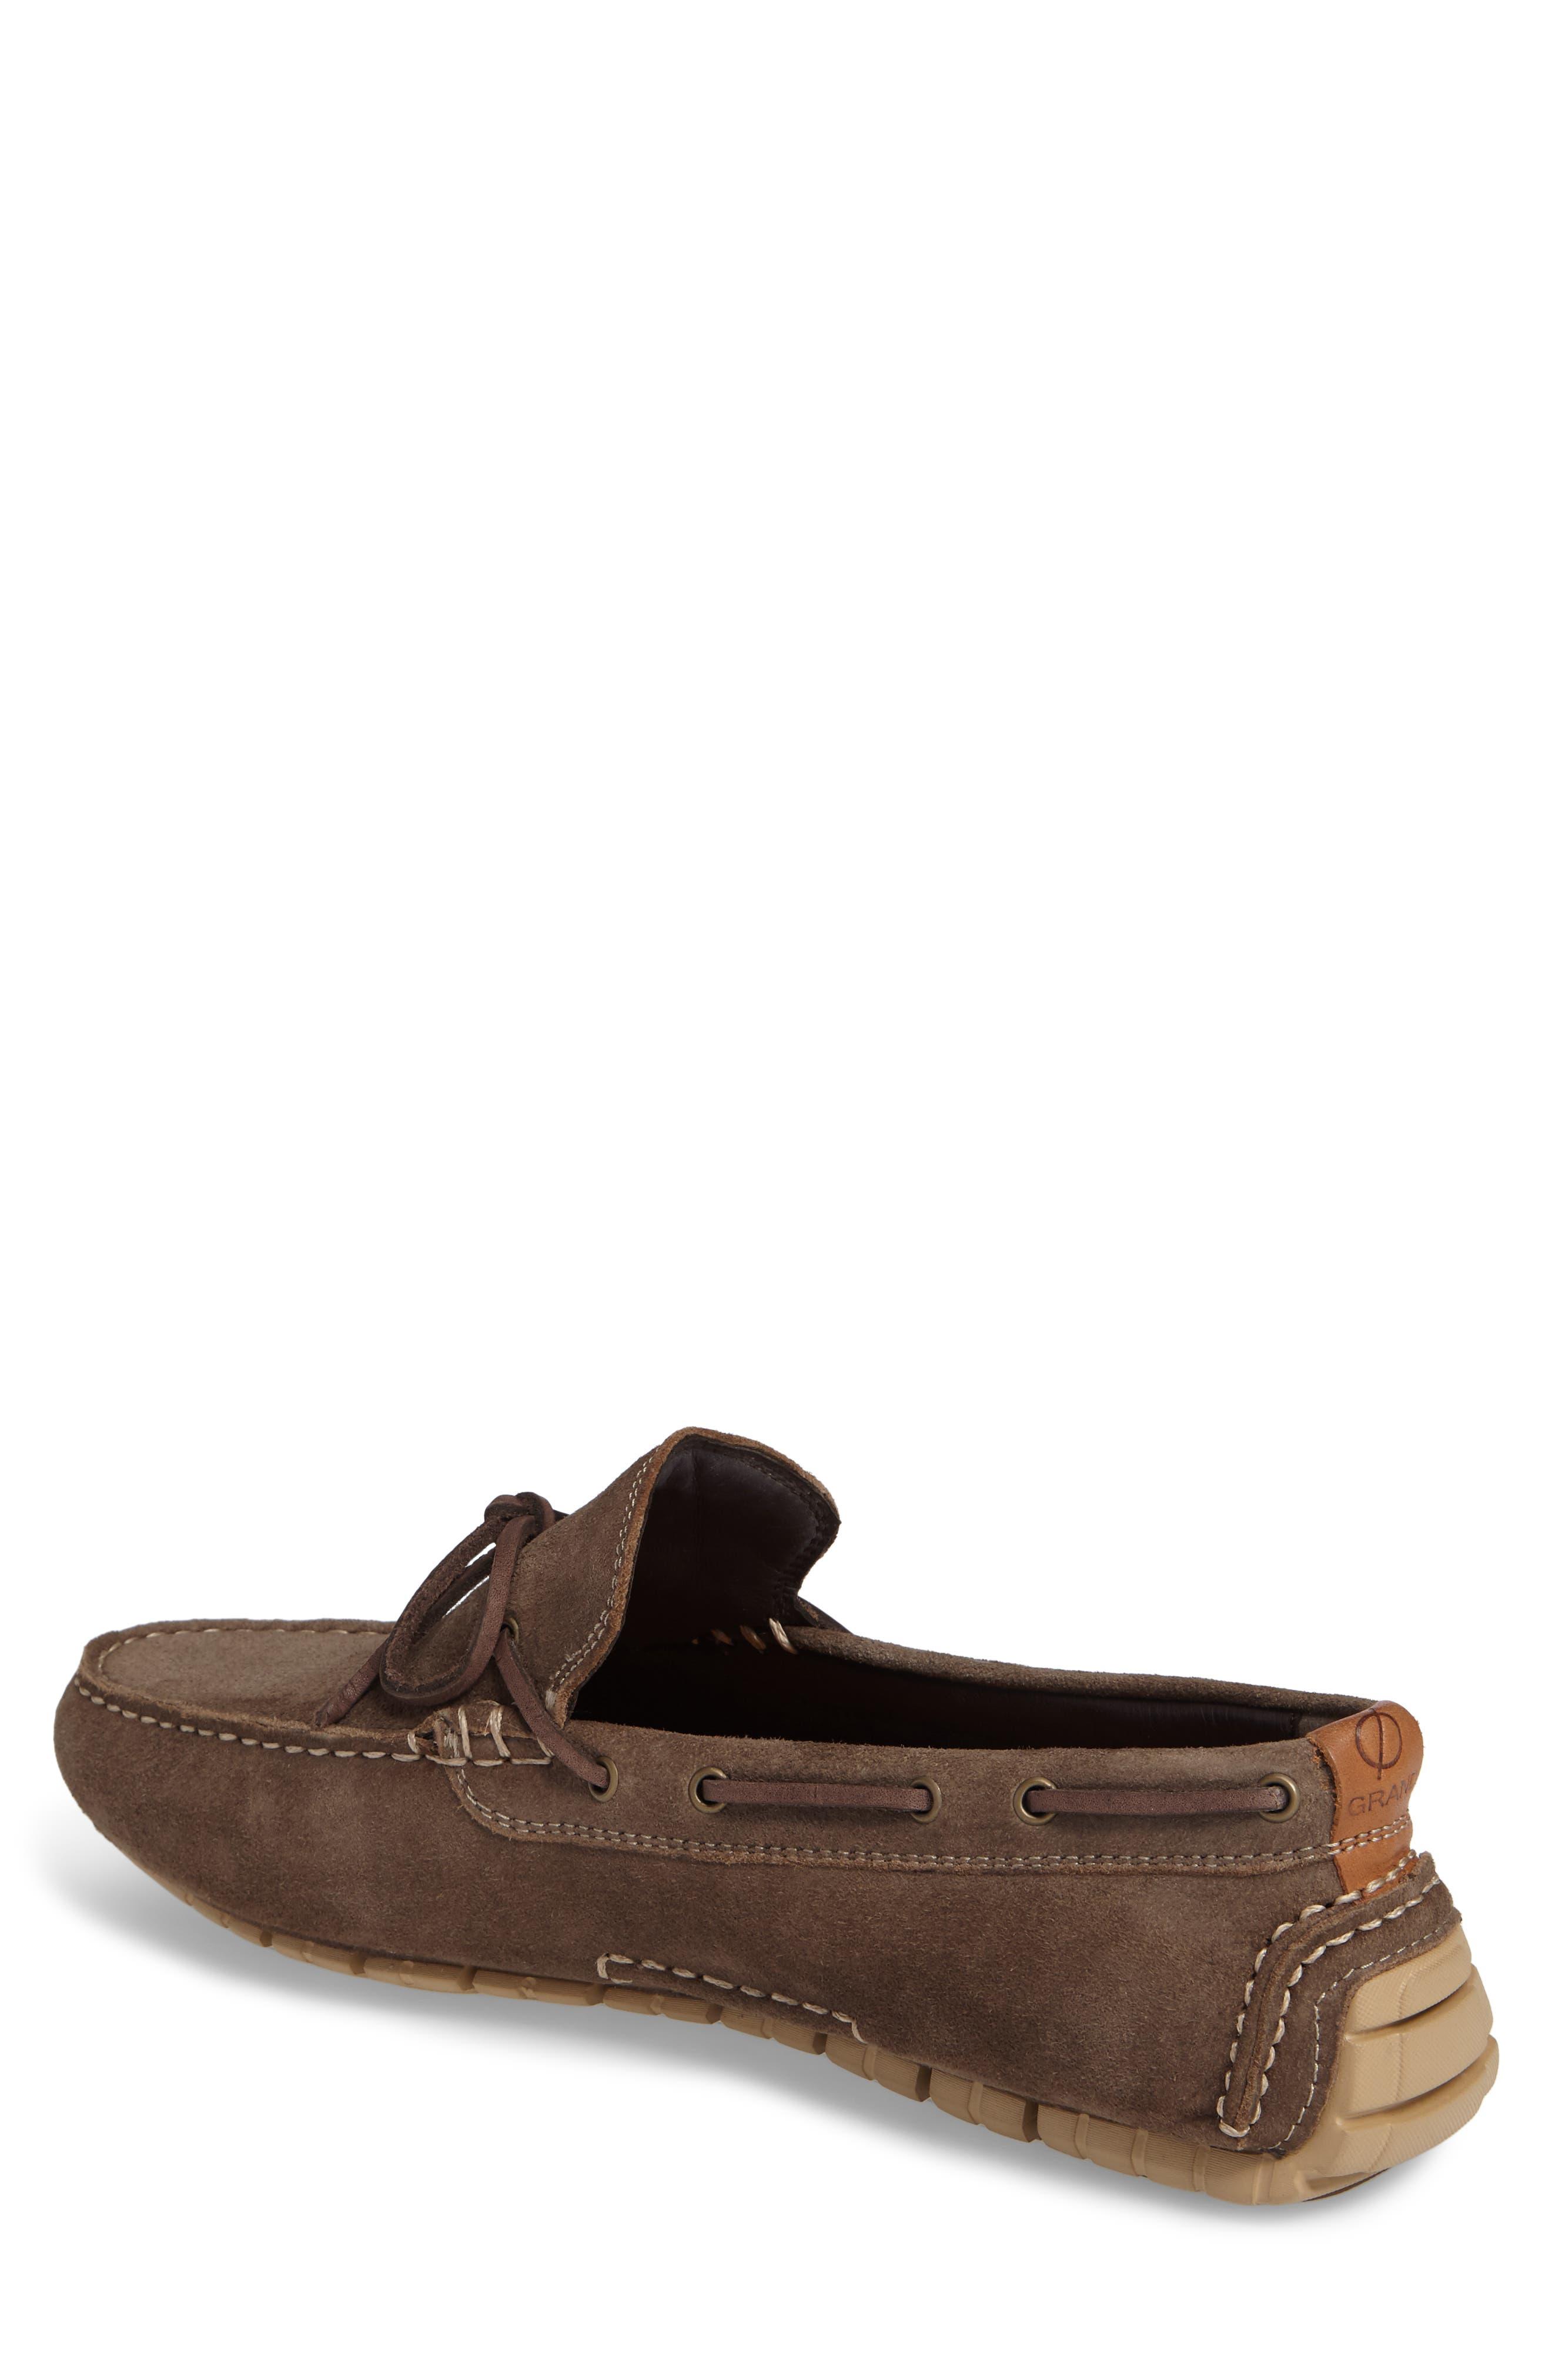 Zero Grand Moc Driving Loafer,                             Alternate thumbnail 2, color,                             Morel Leather